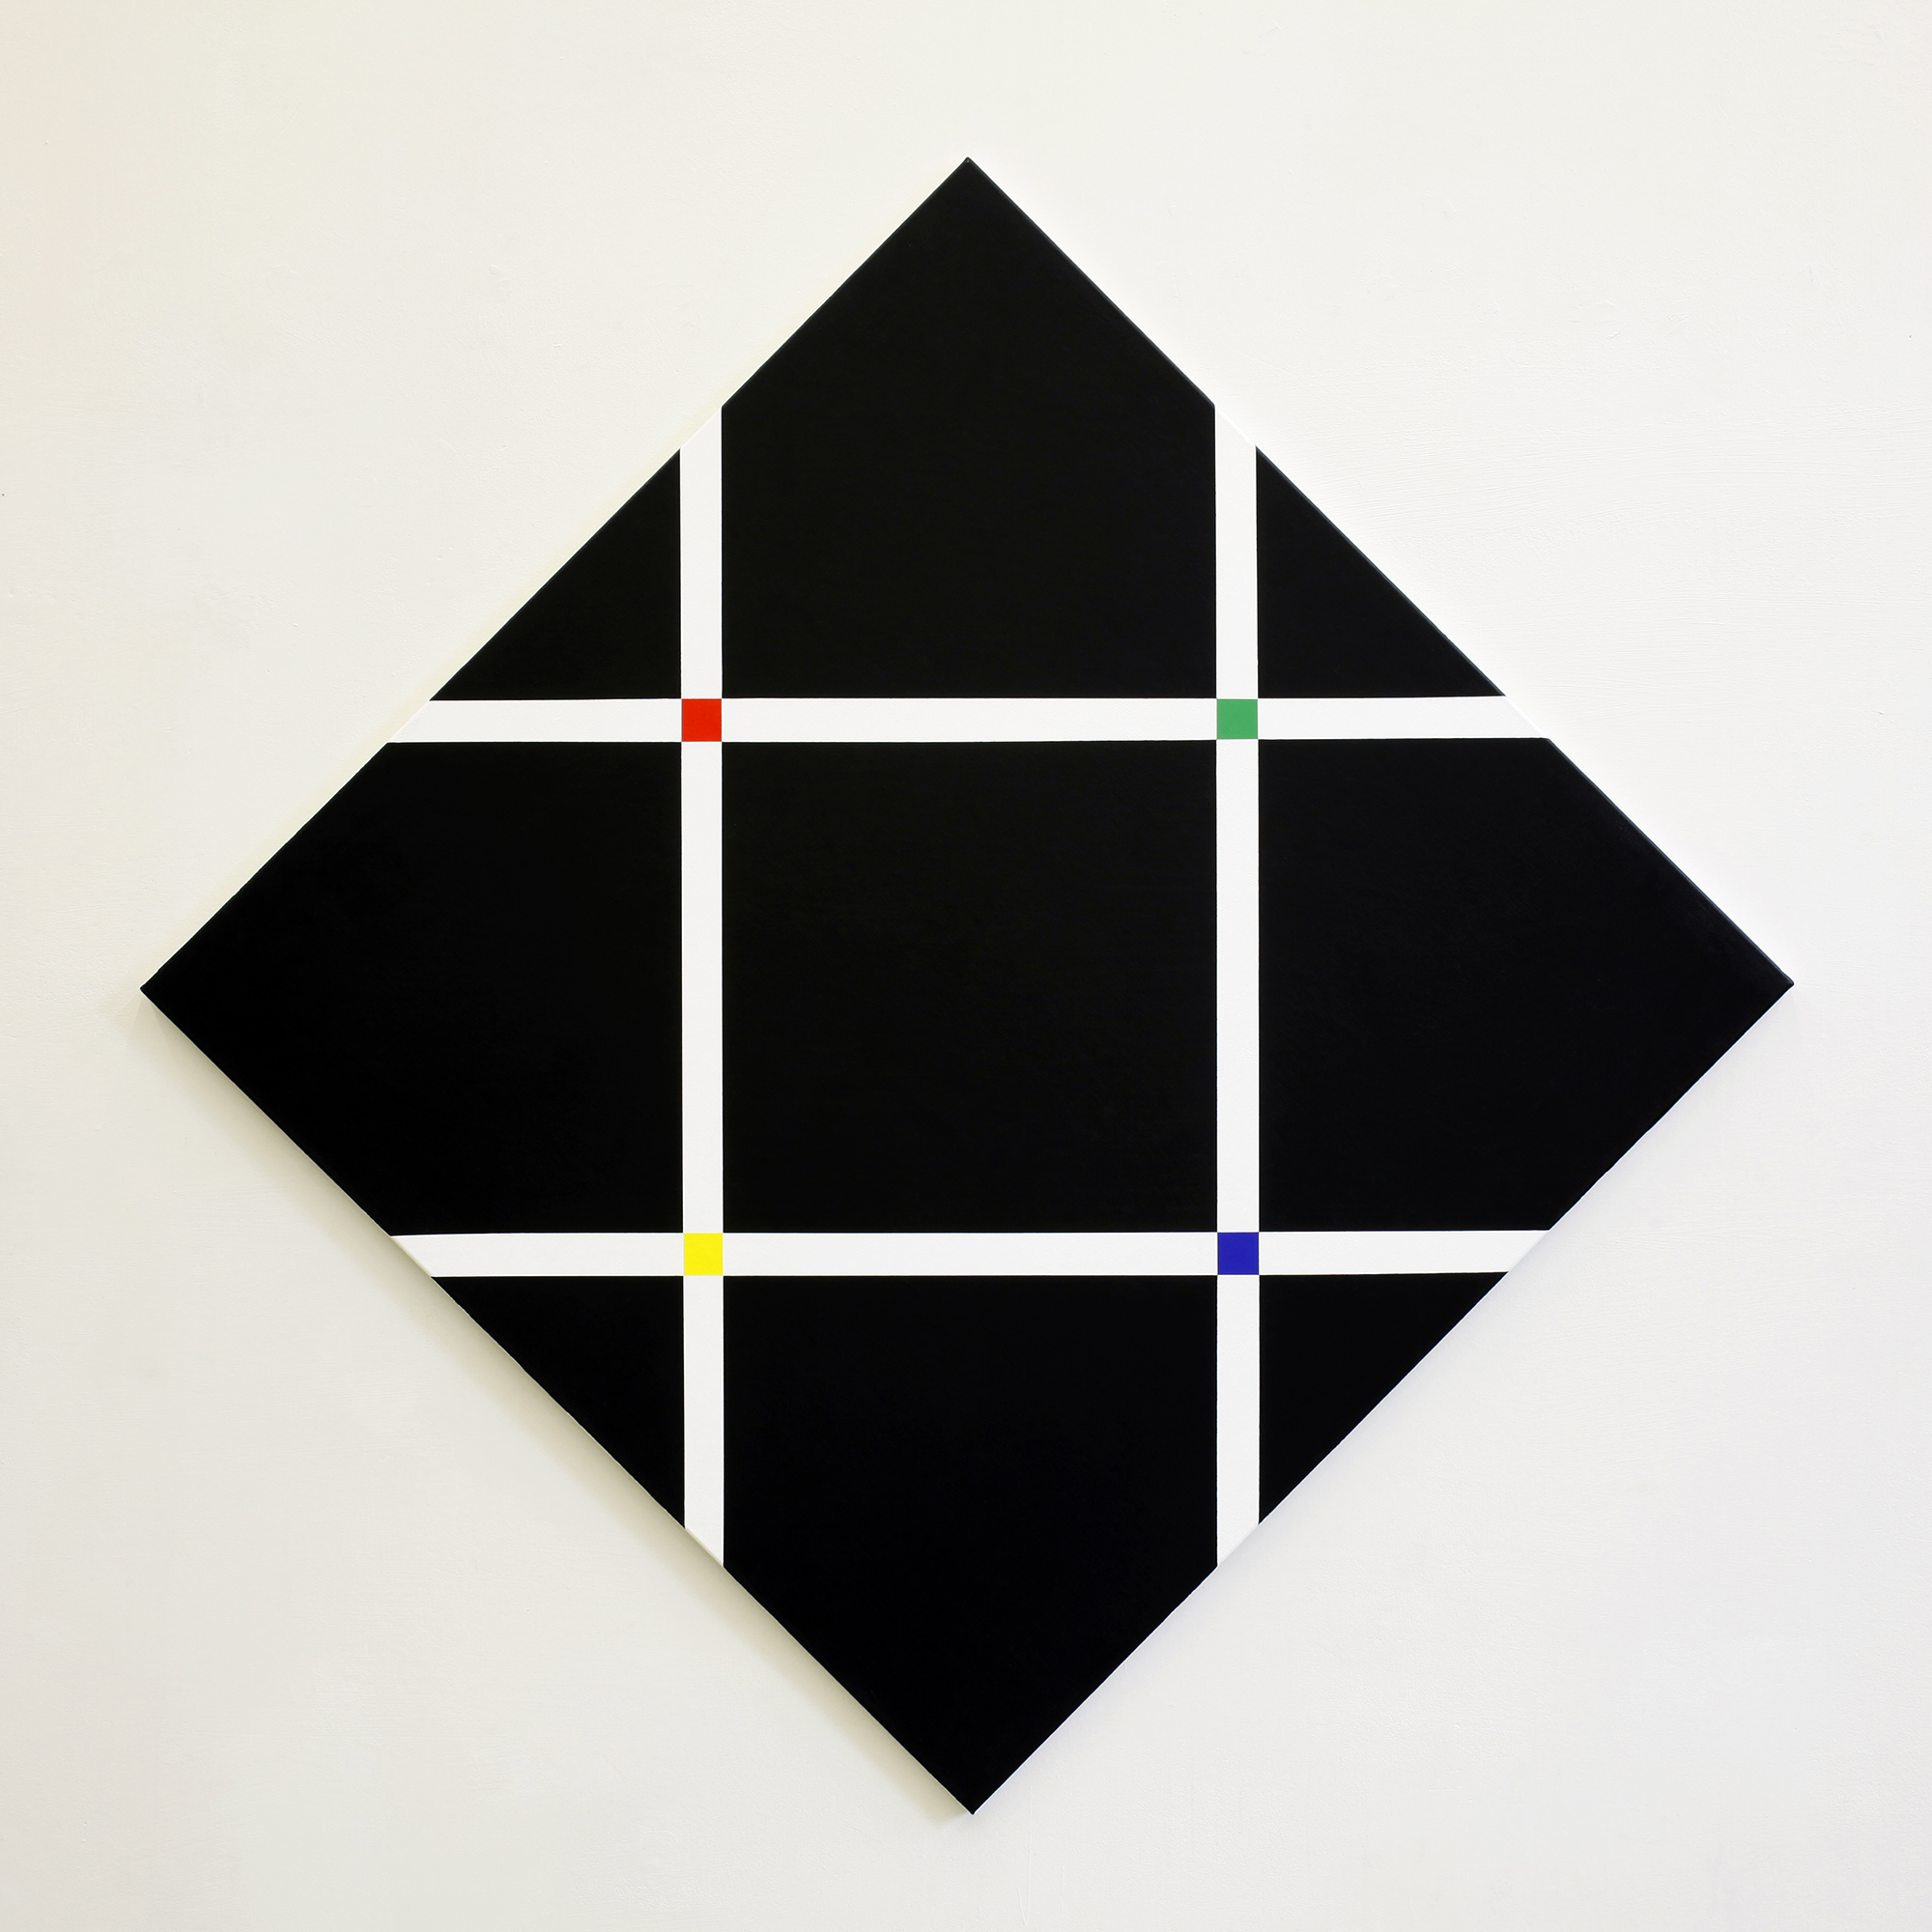 Untitled, 2010, acrylic on canvas, 155 x 155 cm